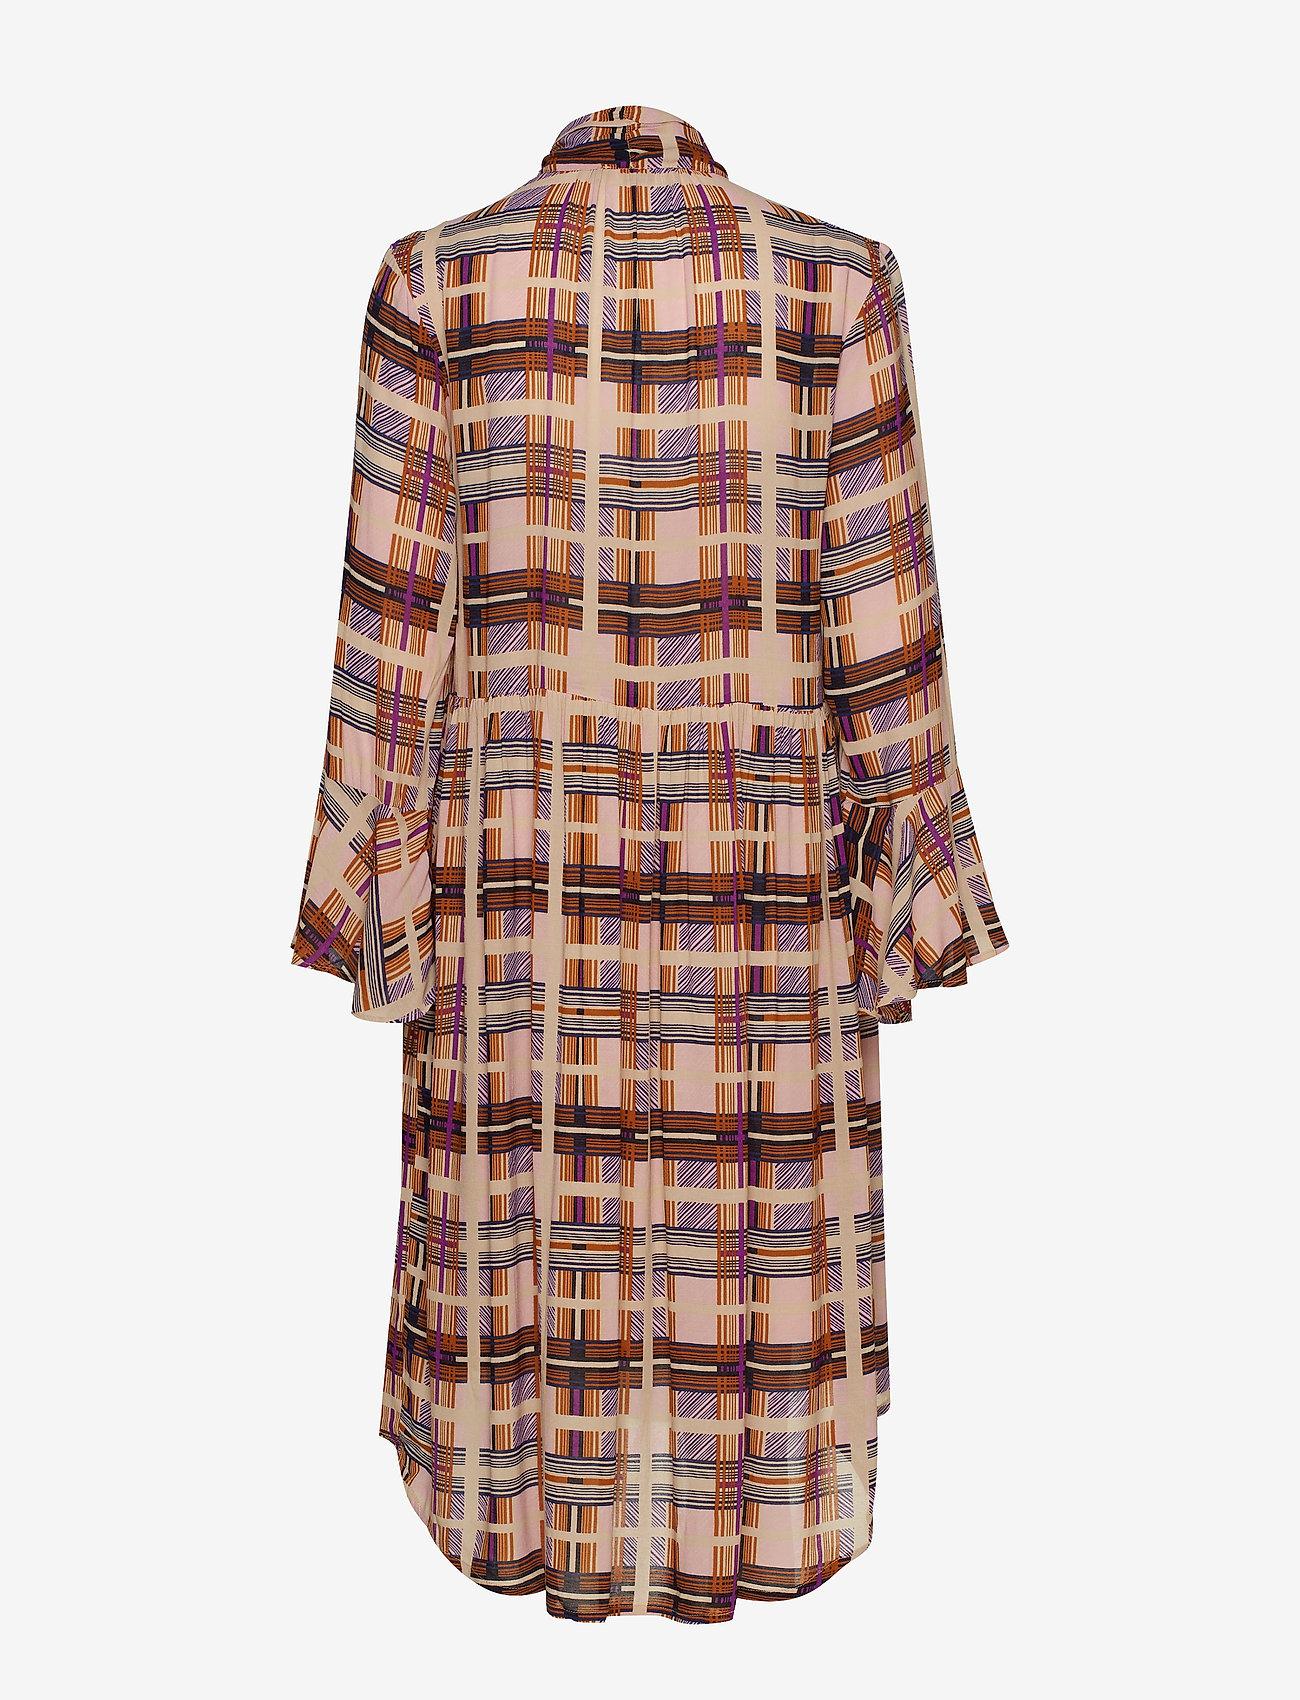 Checka Dress (Dachshund Brown) - Cream Yl3aqW